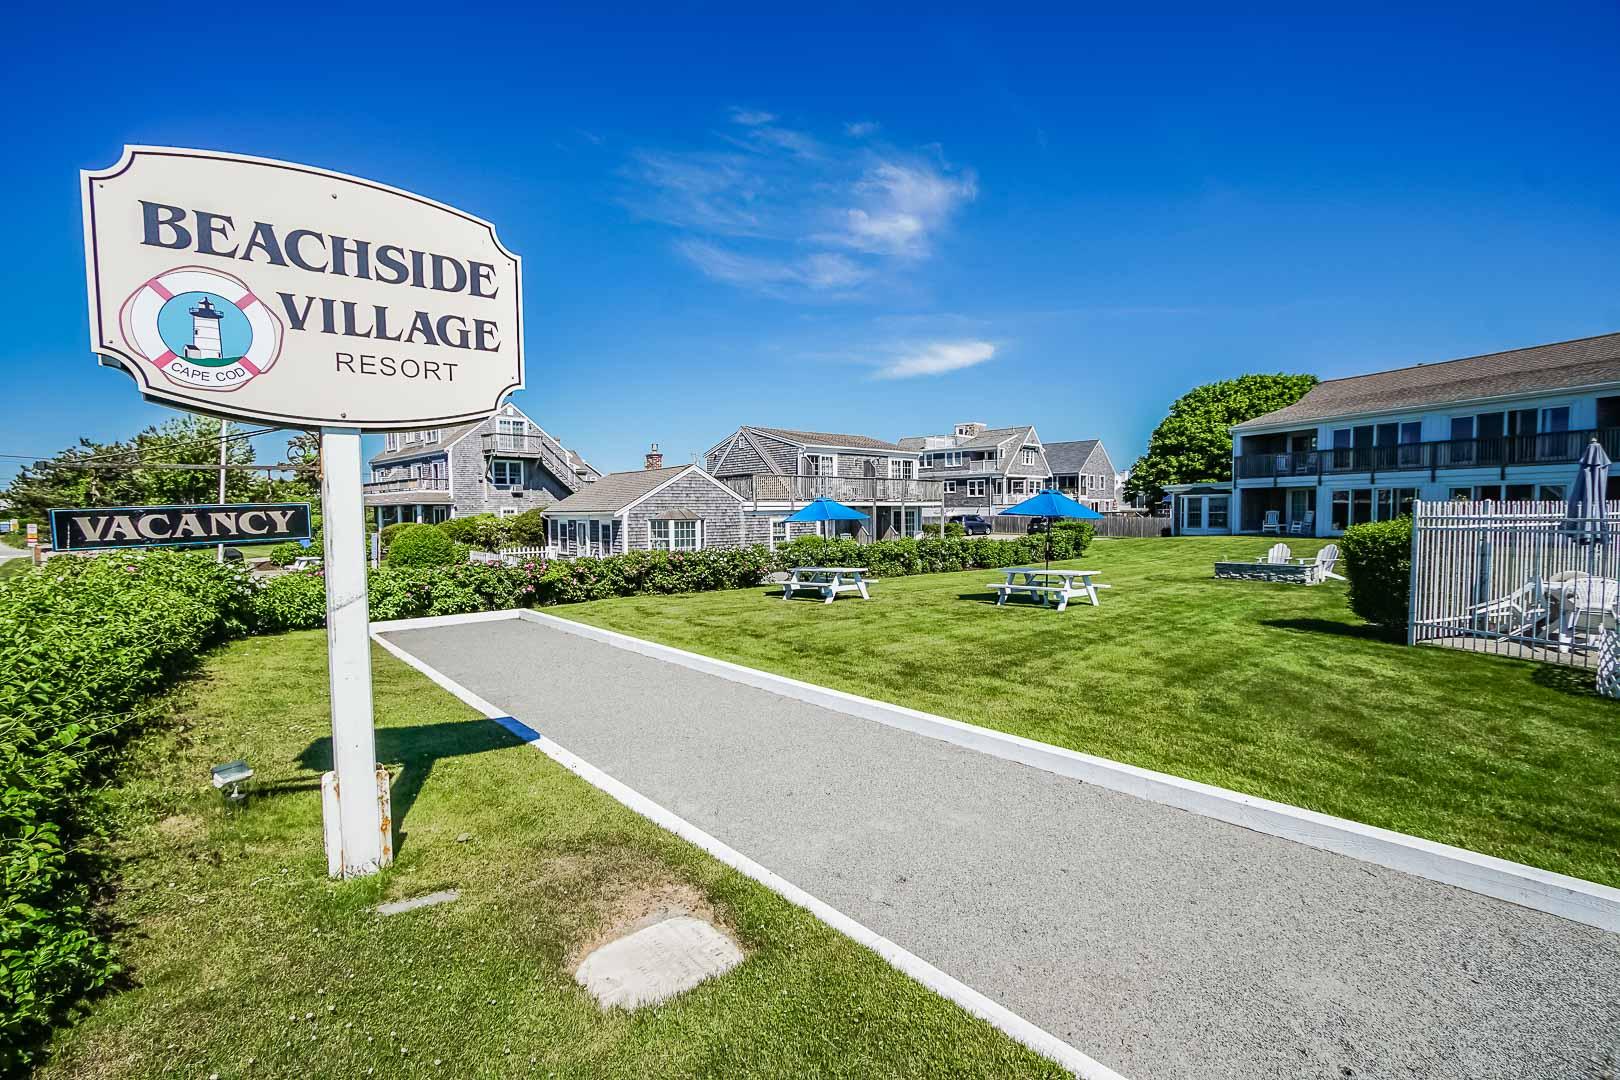 An inviting resort entrance at VRI's Beachside Village Resort in Massachusetts.